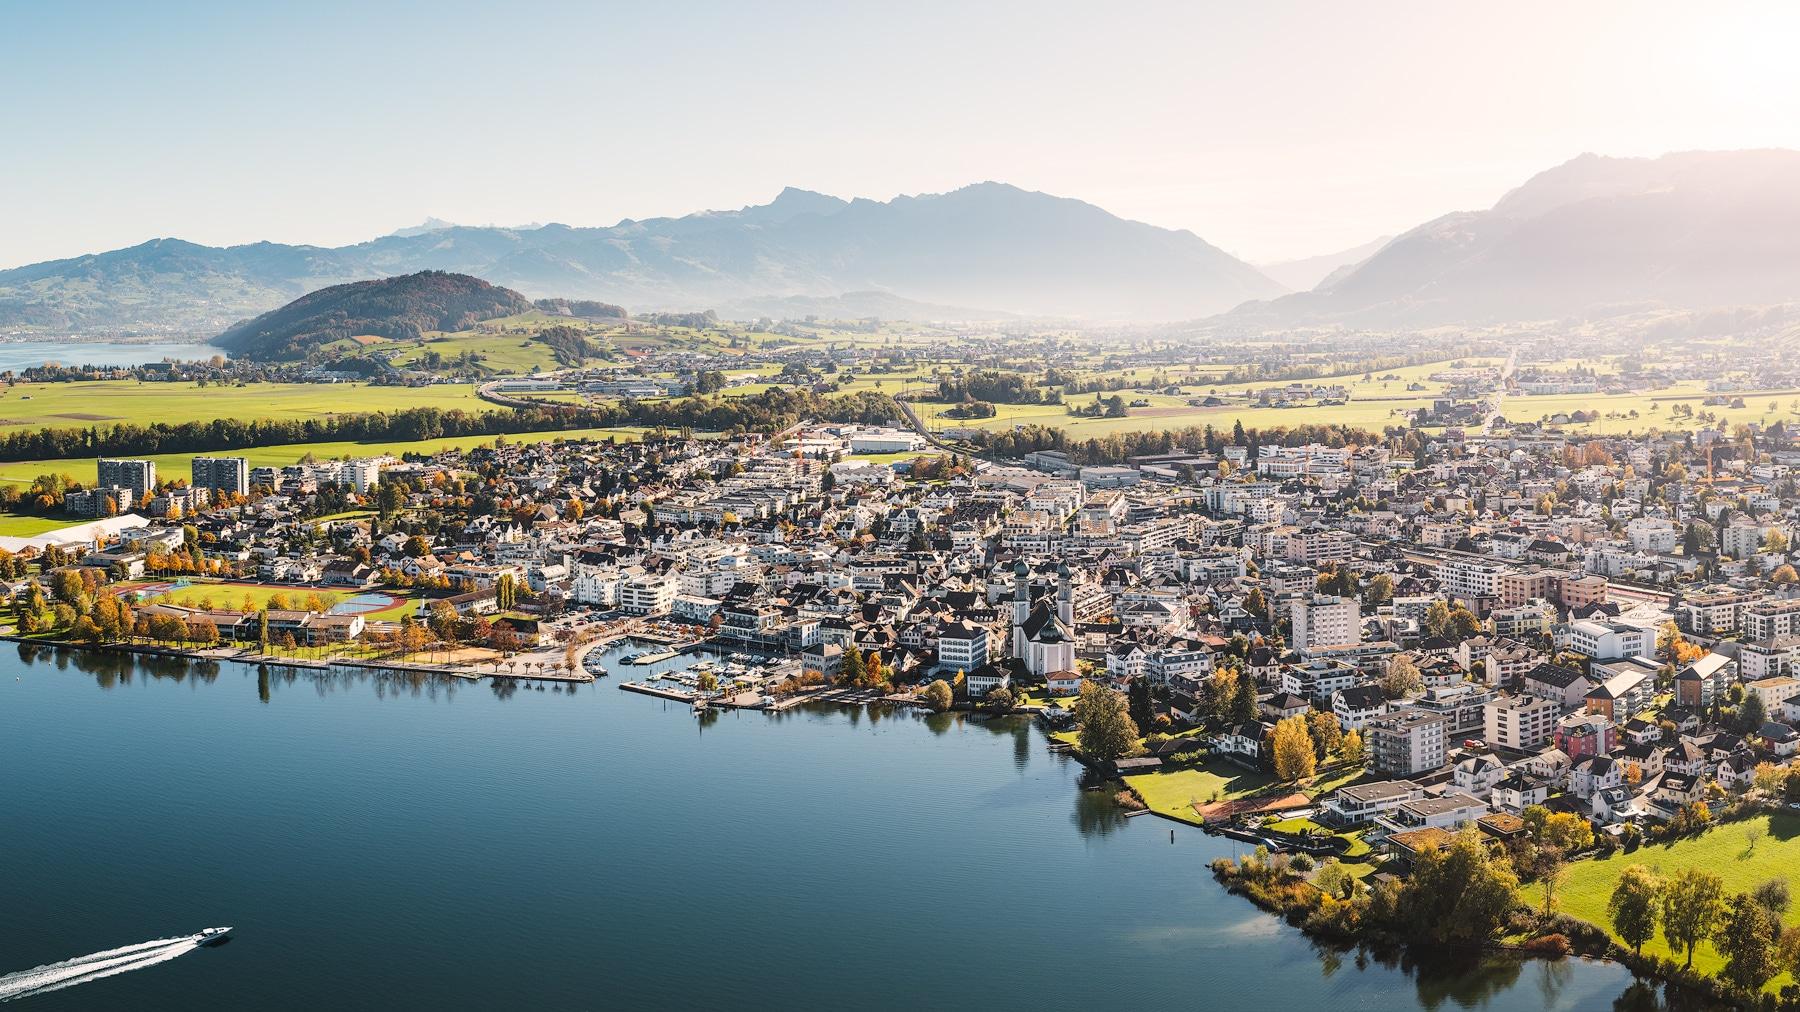 Luftaufnahme - Obersee - Lachen - Hafen - Marina - Linthebene